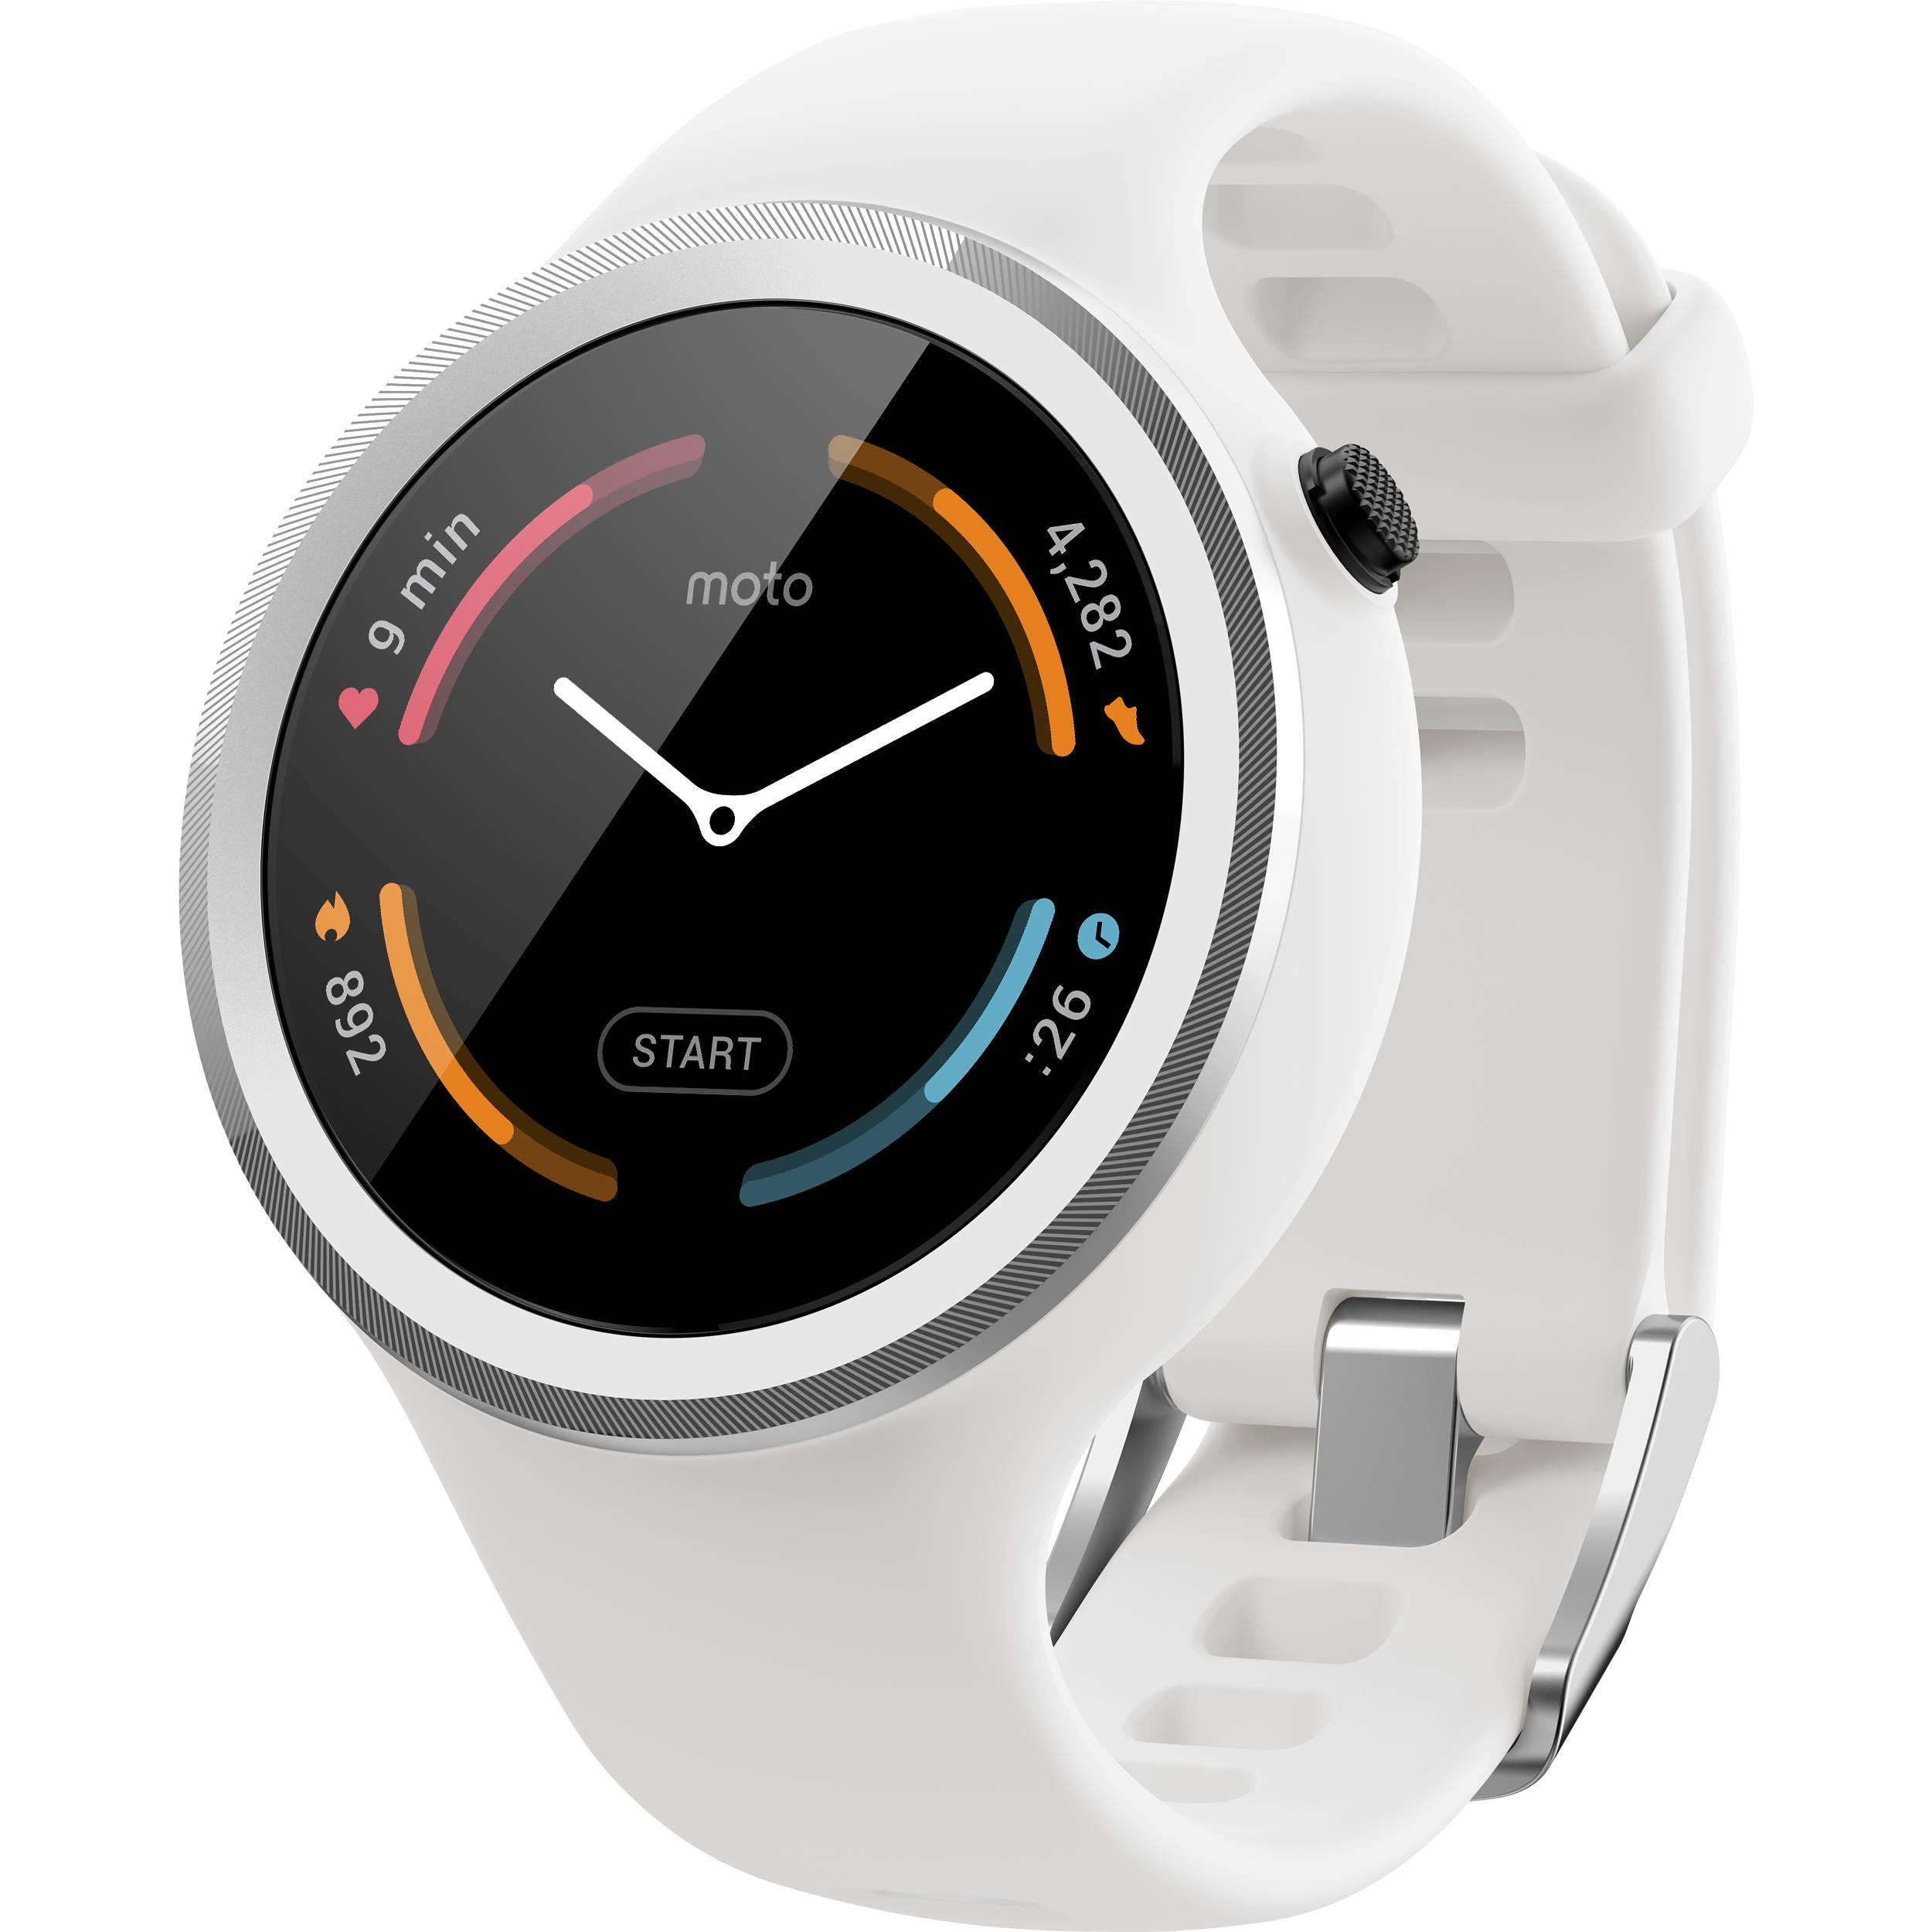 Motorola Moto 360 Sport Smartwatch (White) 00866NARTL B&H ...